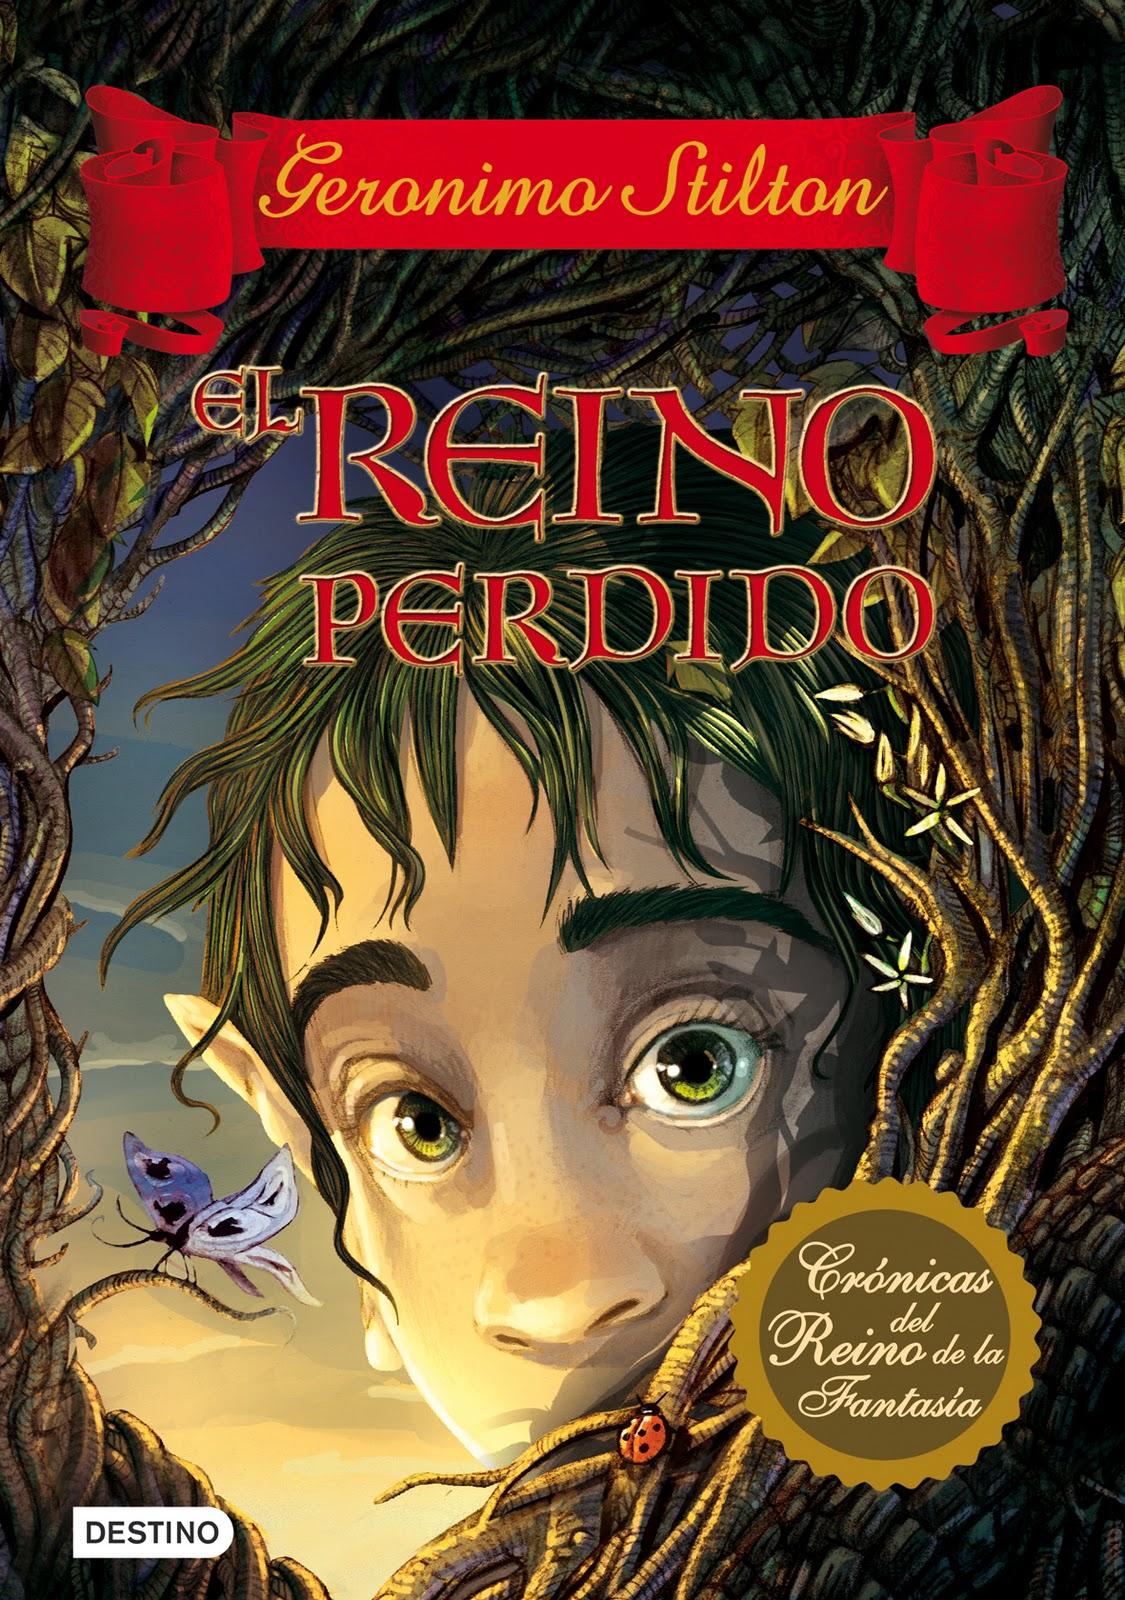 Libros e historietas de Pelayo: El Reino Perdido.